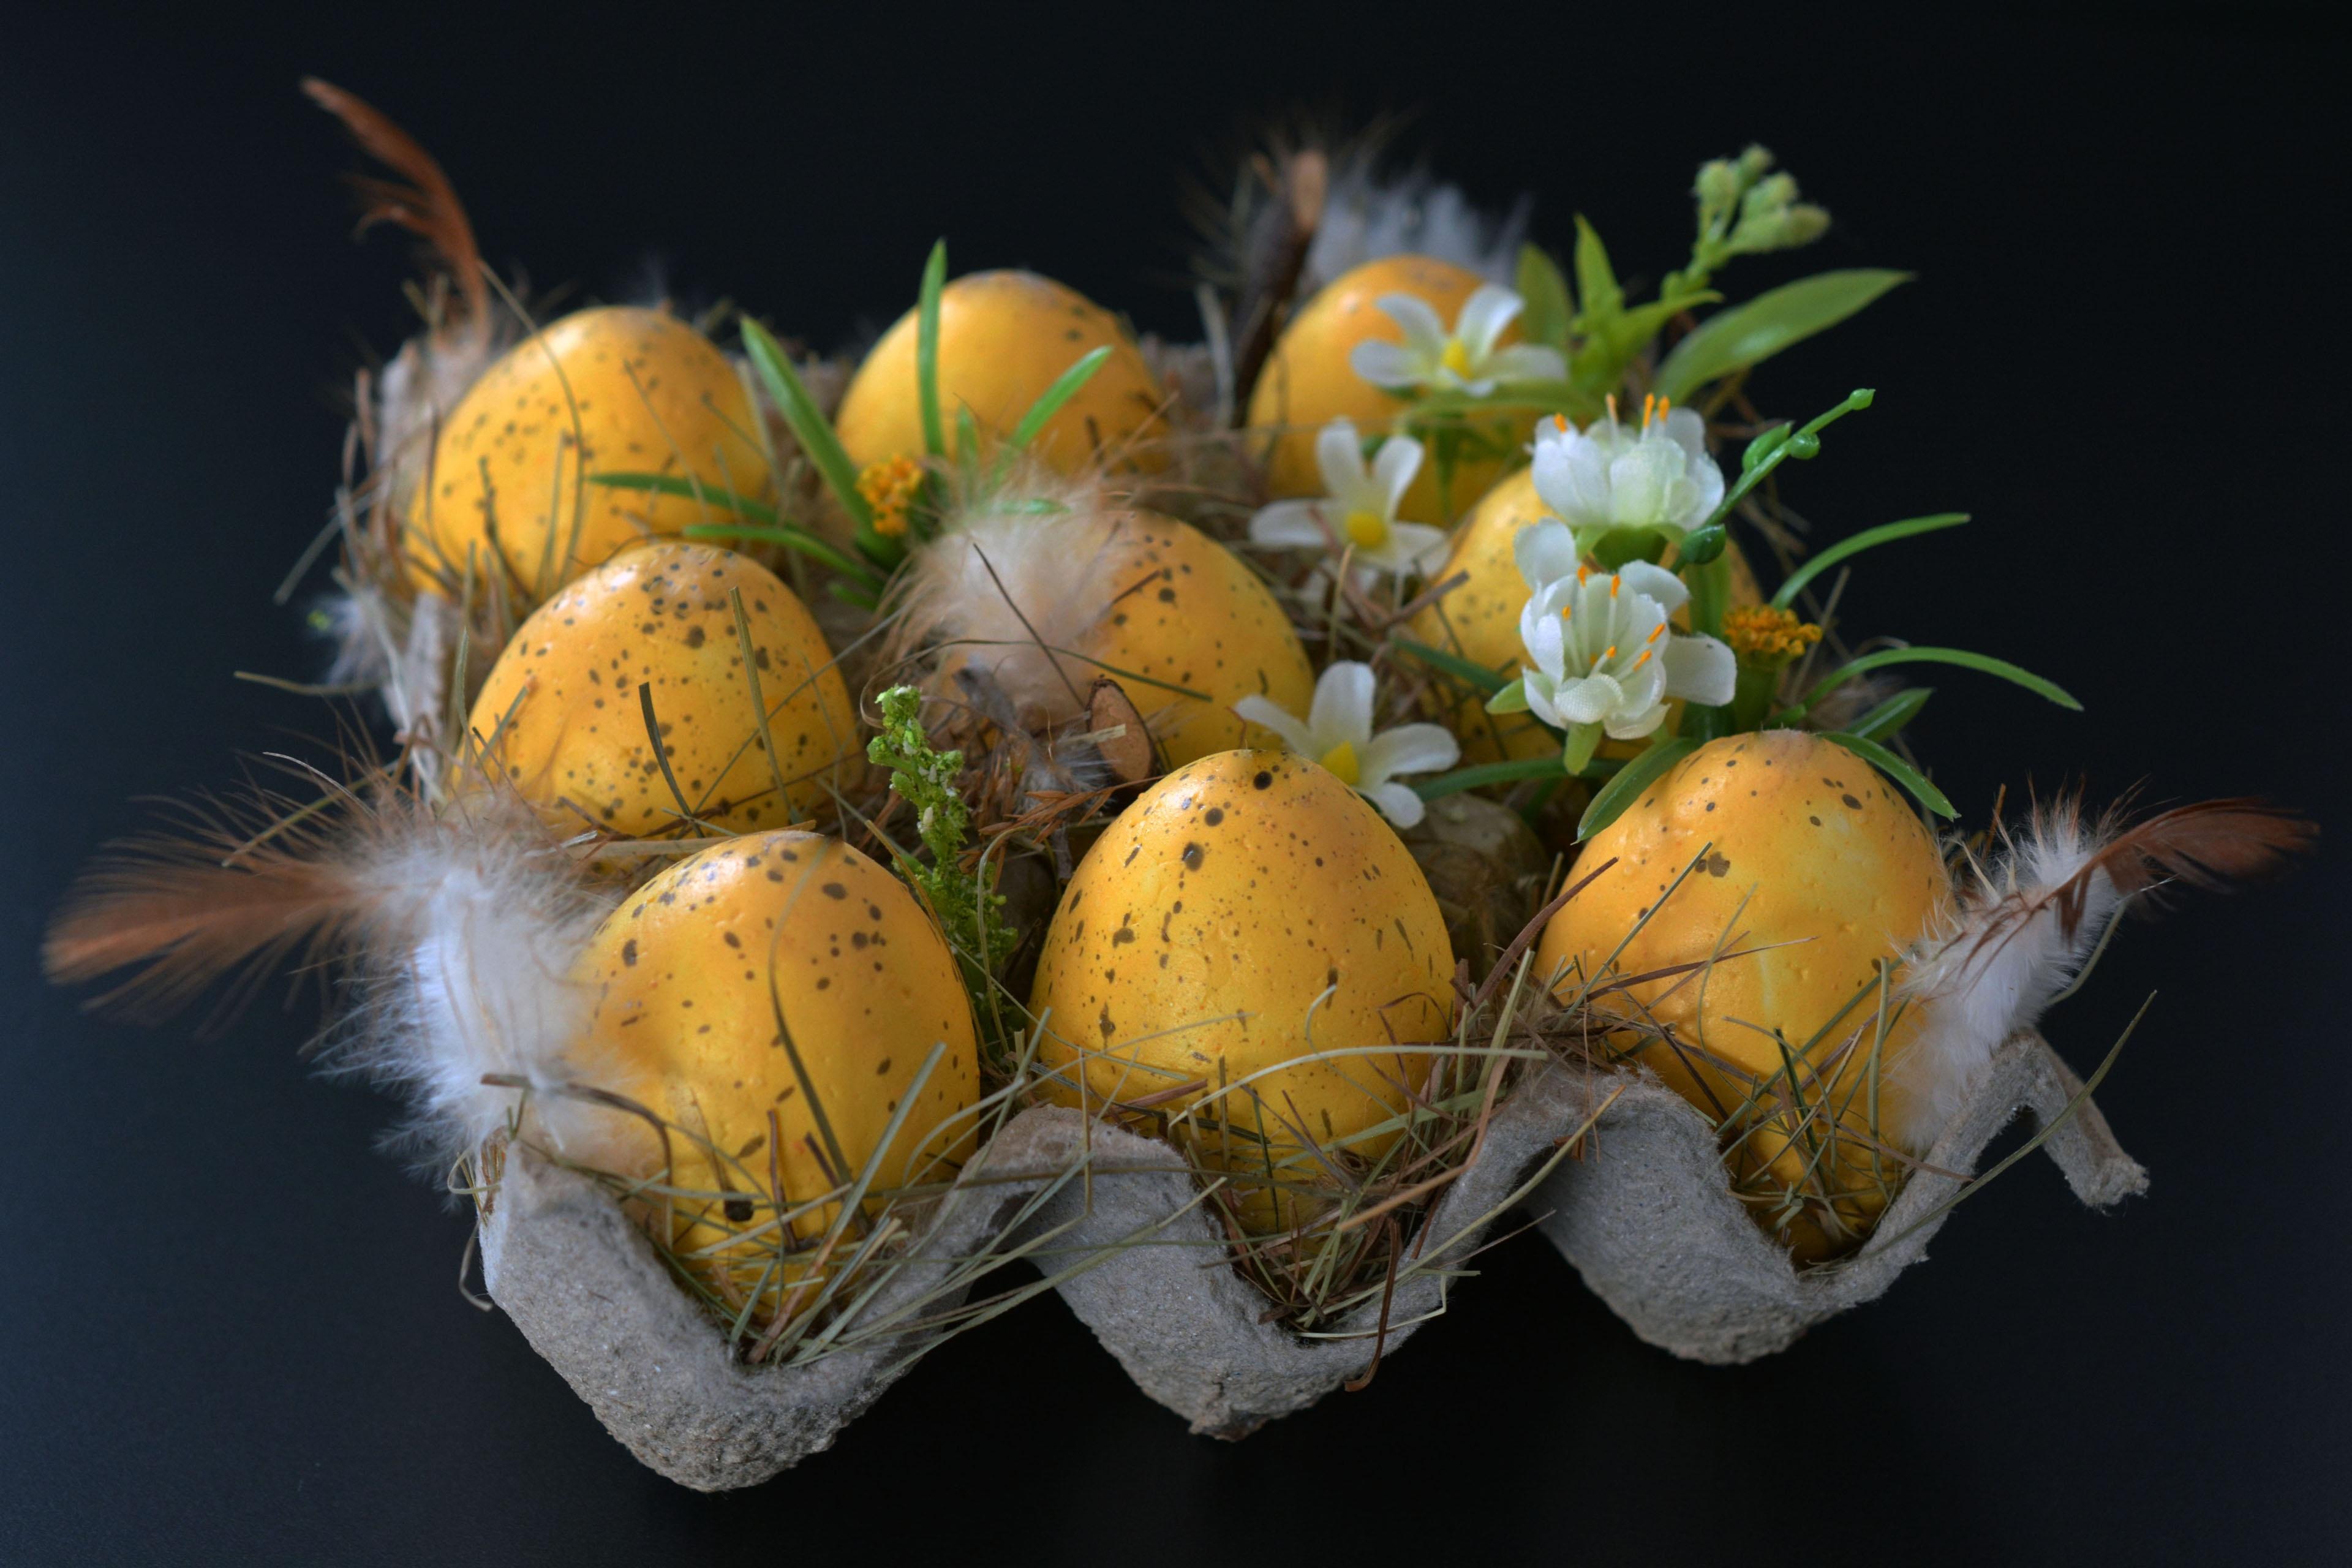 67252 descargar fondo de pantalla Vacaciones, Huevos De Pascua, Decoraciones, Flores, Pascua, Huevos, Pluma: protectores de pantalla e imágenes gratis